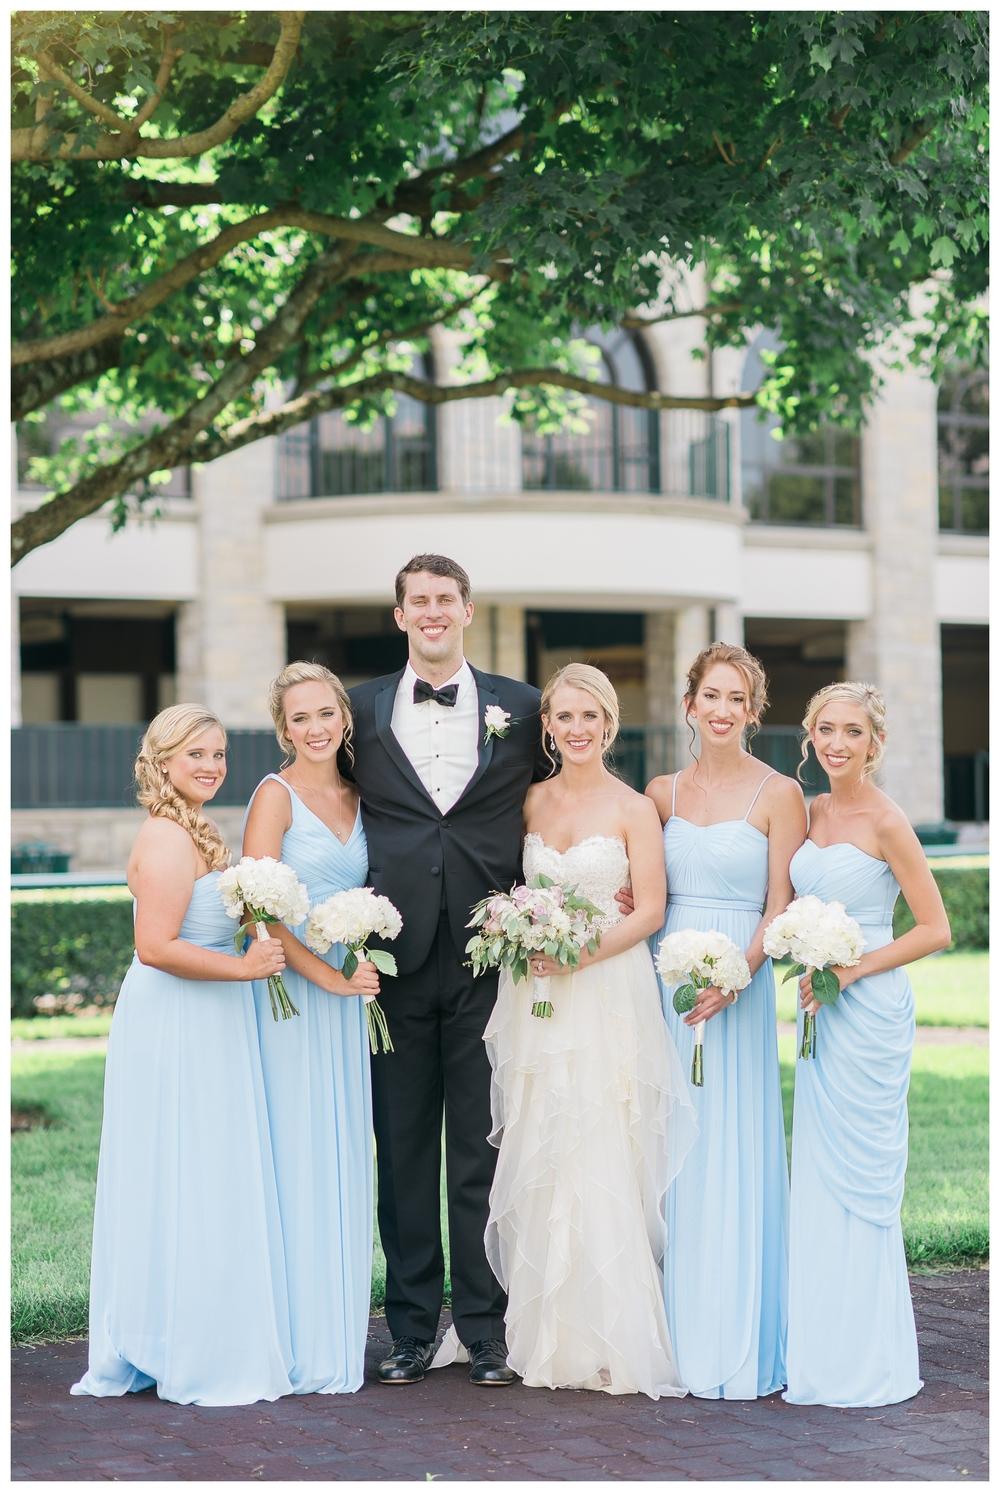 Rebecca_Bridges_Photography_Indianapolis_Wedding_Photographer_4544.jpg